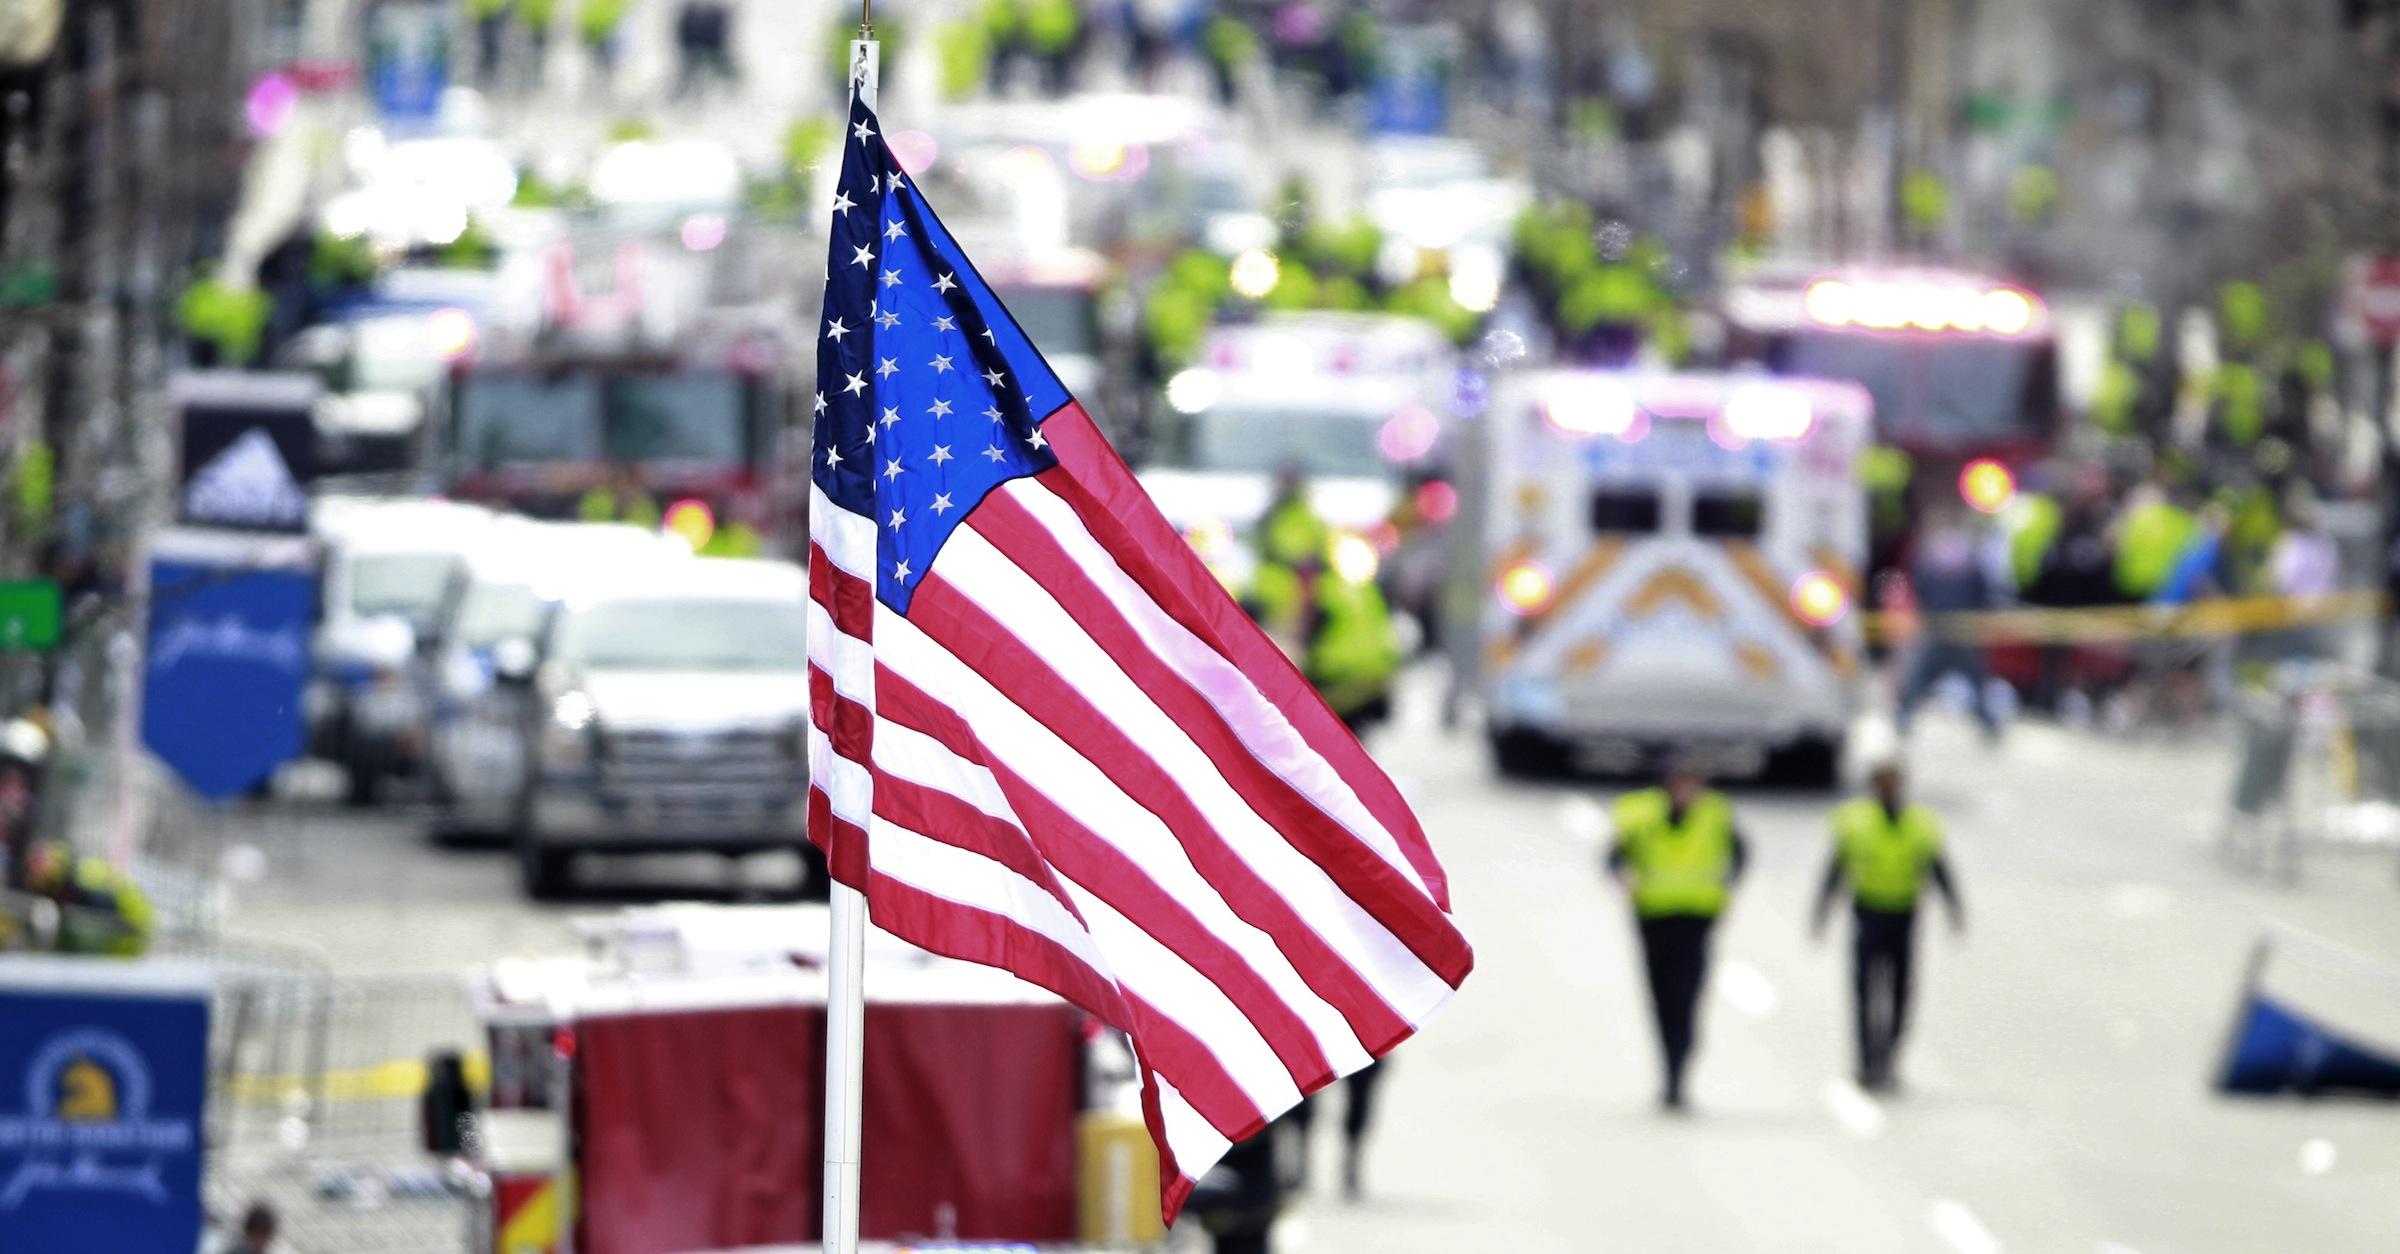 Flag at Boston Marathon